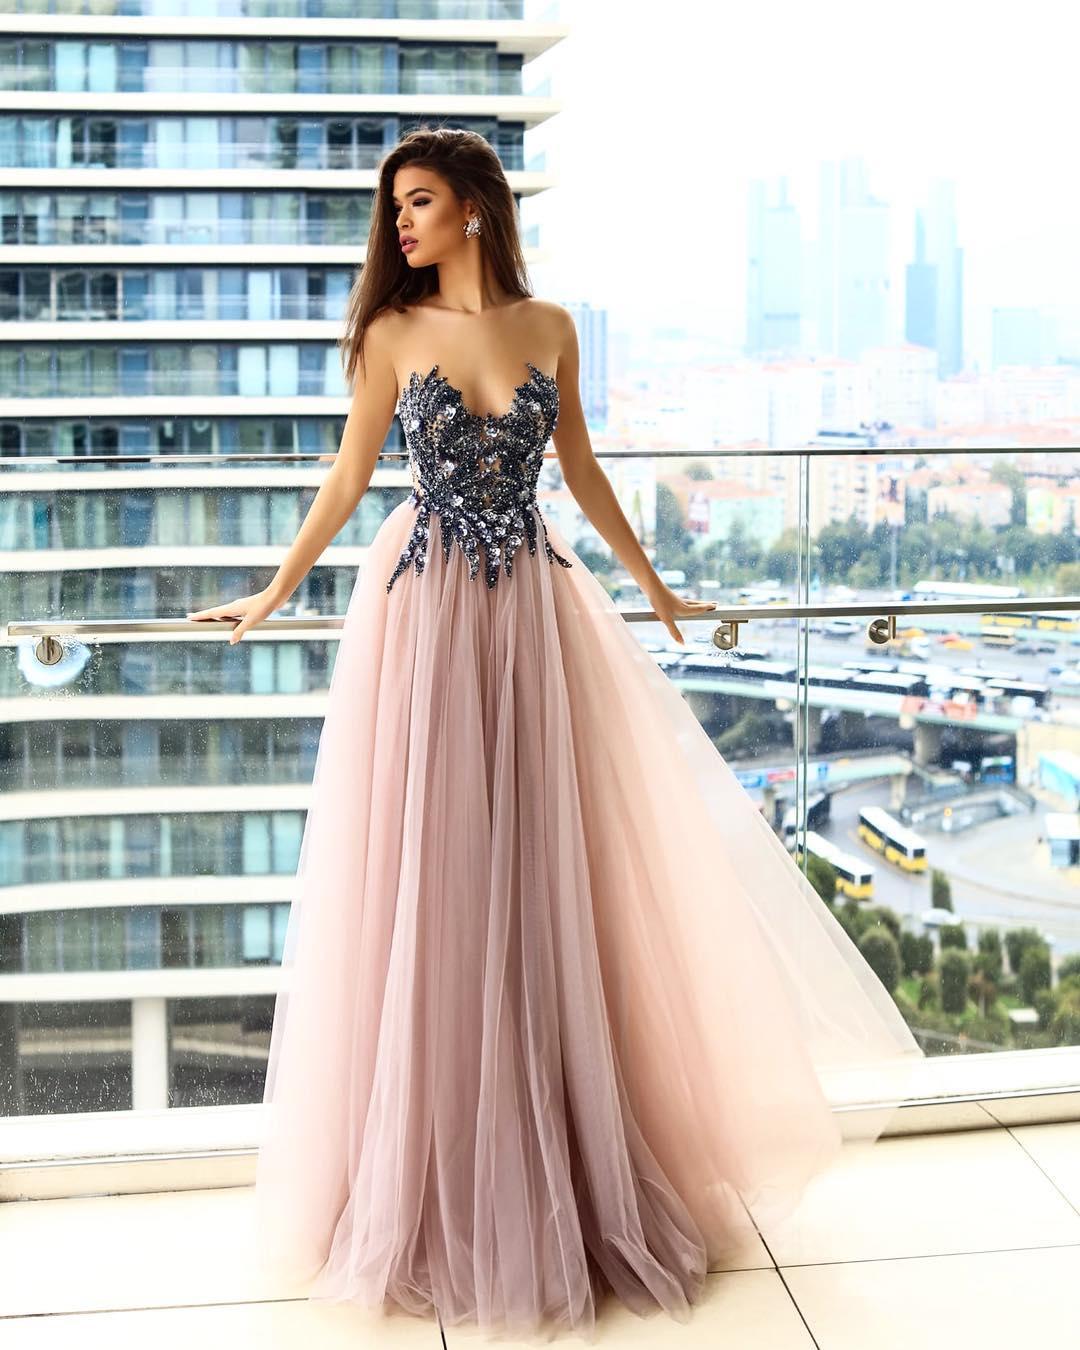 Vestidos Casuales Modernos 2019